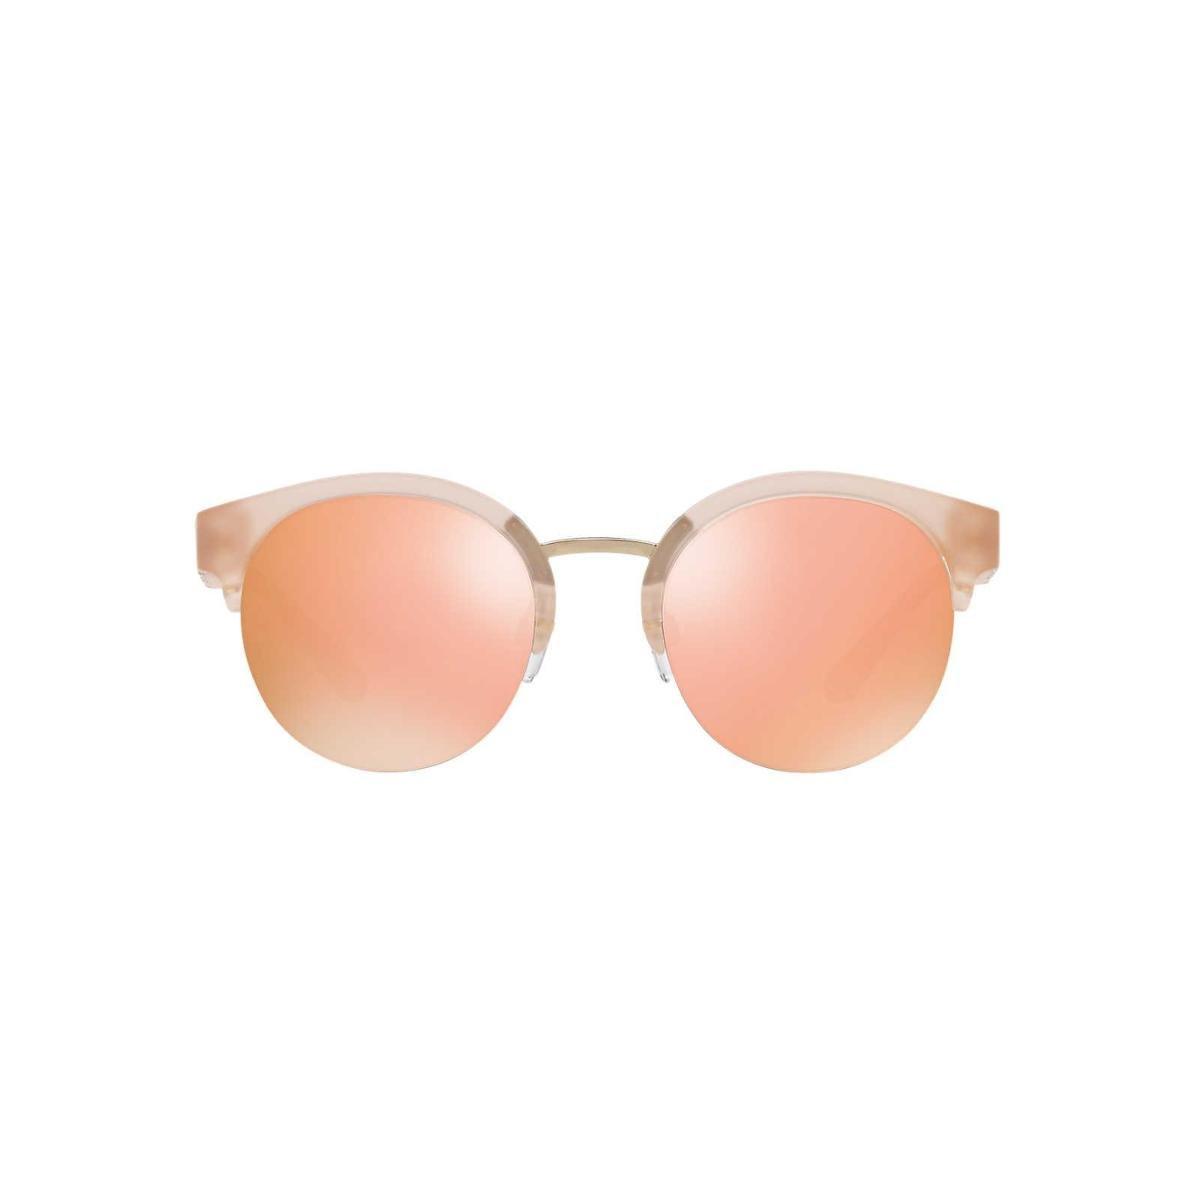 Óculos de Sol Burberry Redondo BE4241 Feminino - Compre Agora   Zattini 28f21abde8